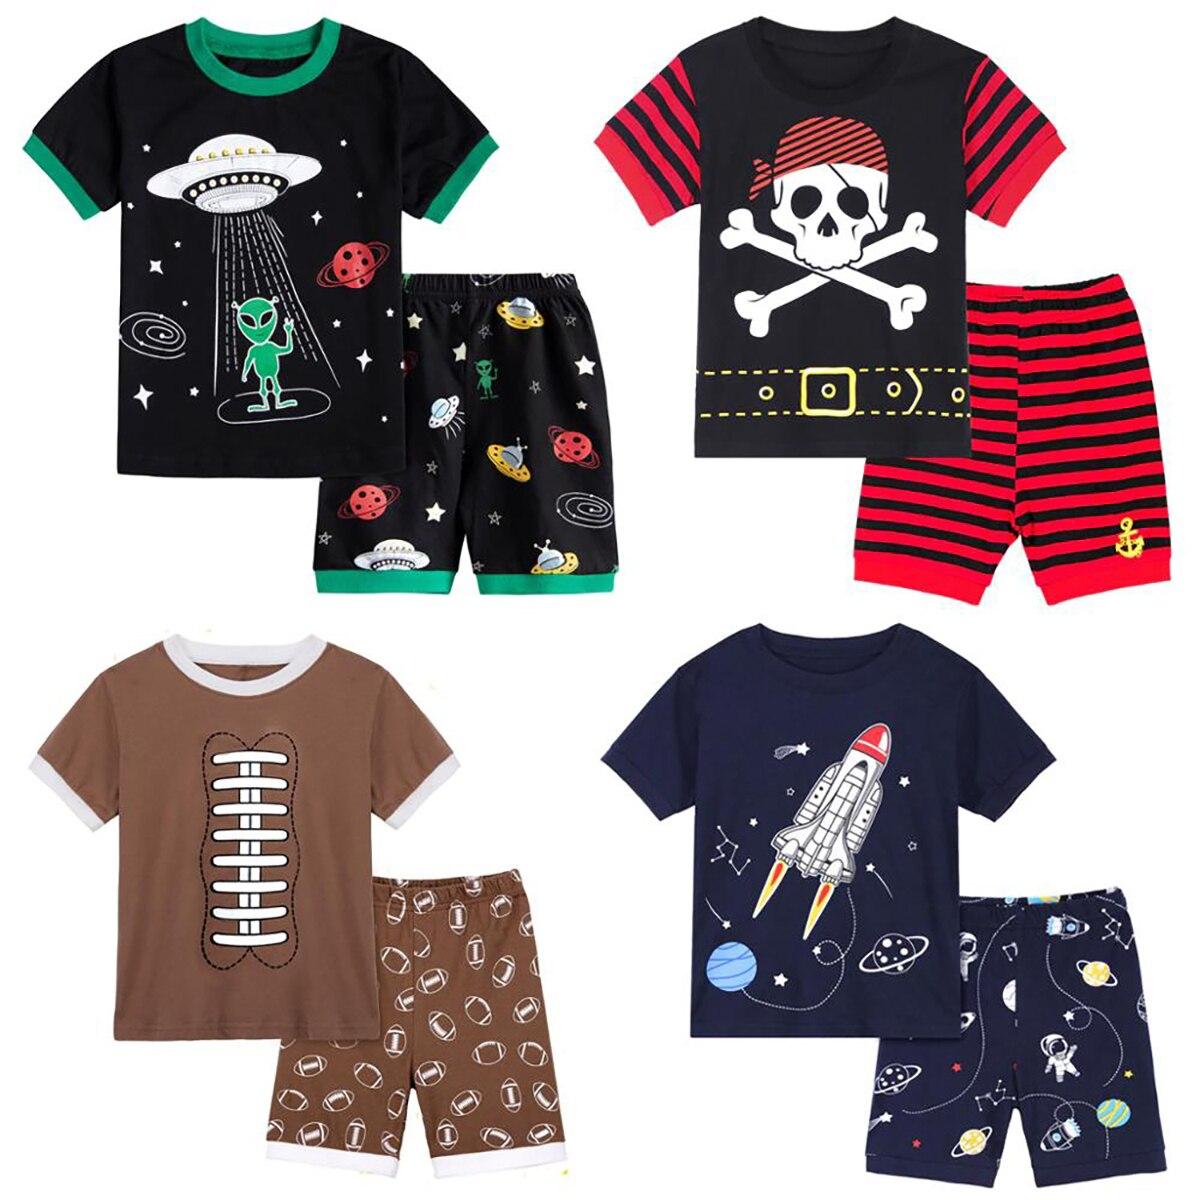 Kids Boy Pirate Shark Excavator Bulldozer Truck Train Pyjamas Set Toddler Spaceship Lorry Pajamas Children Animal Sleepwear